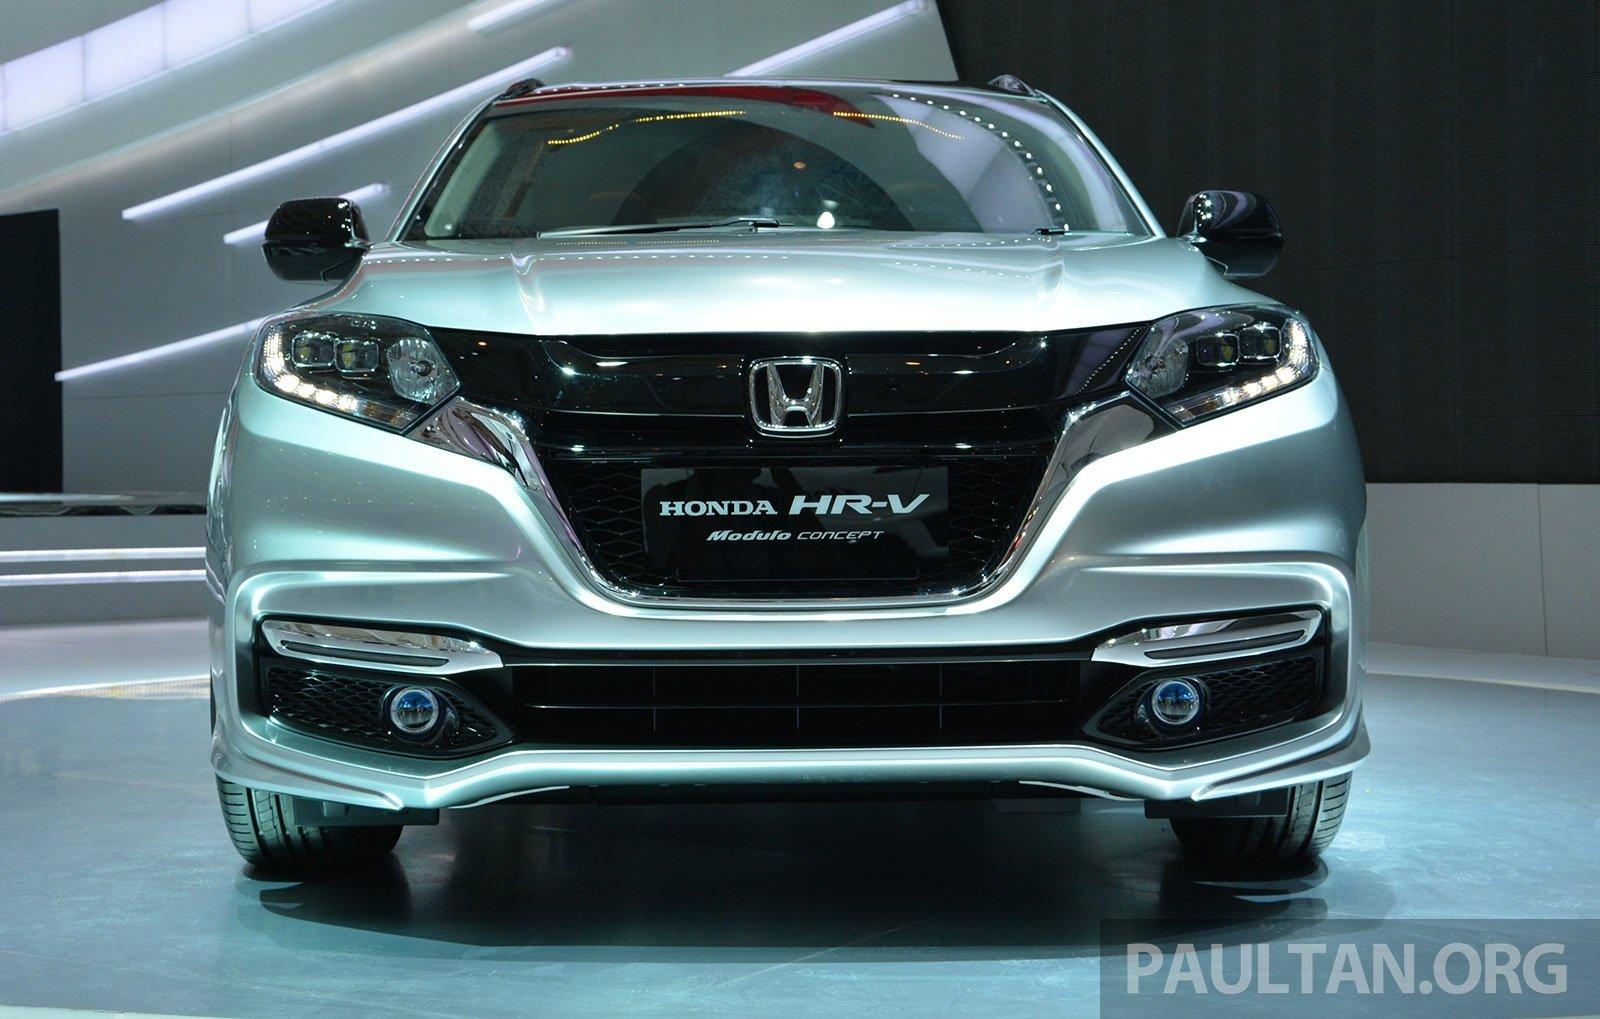 2016 Honda HR-V 1.5 and 1.8 CVT